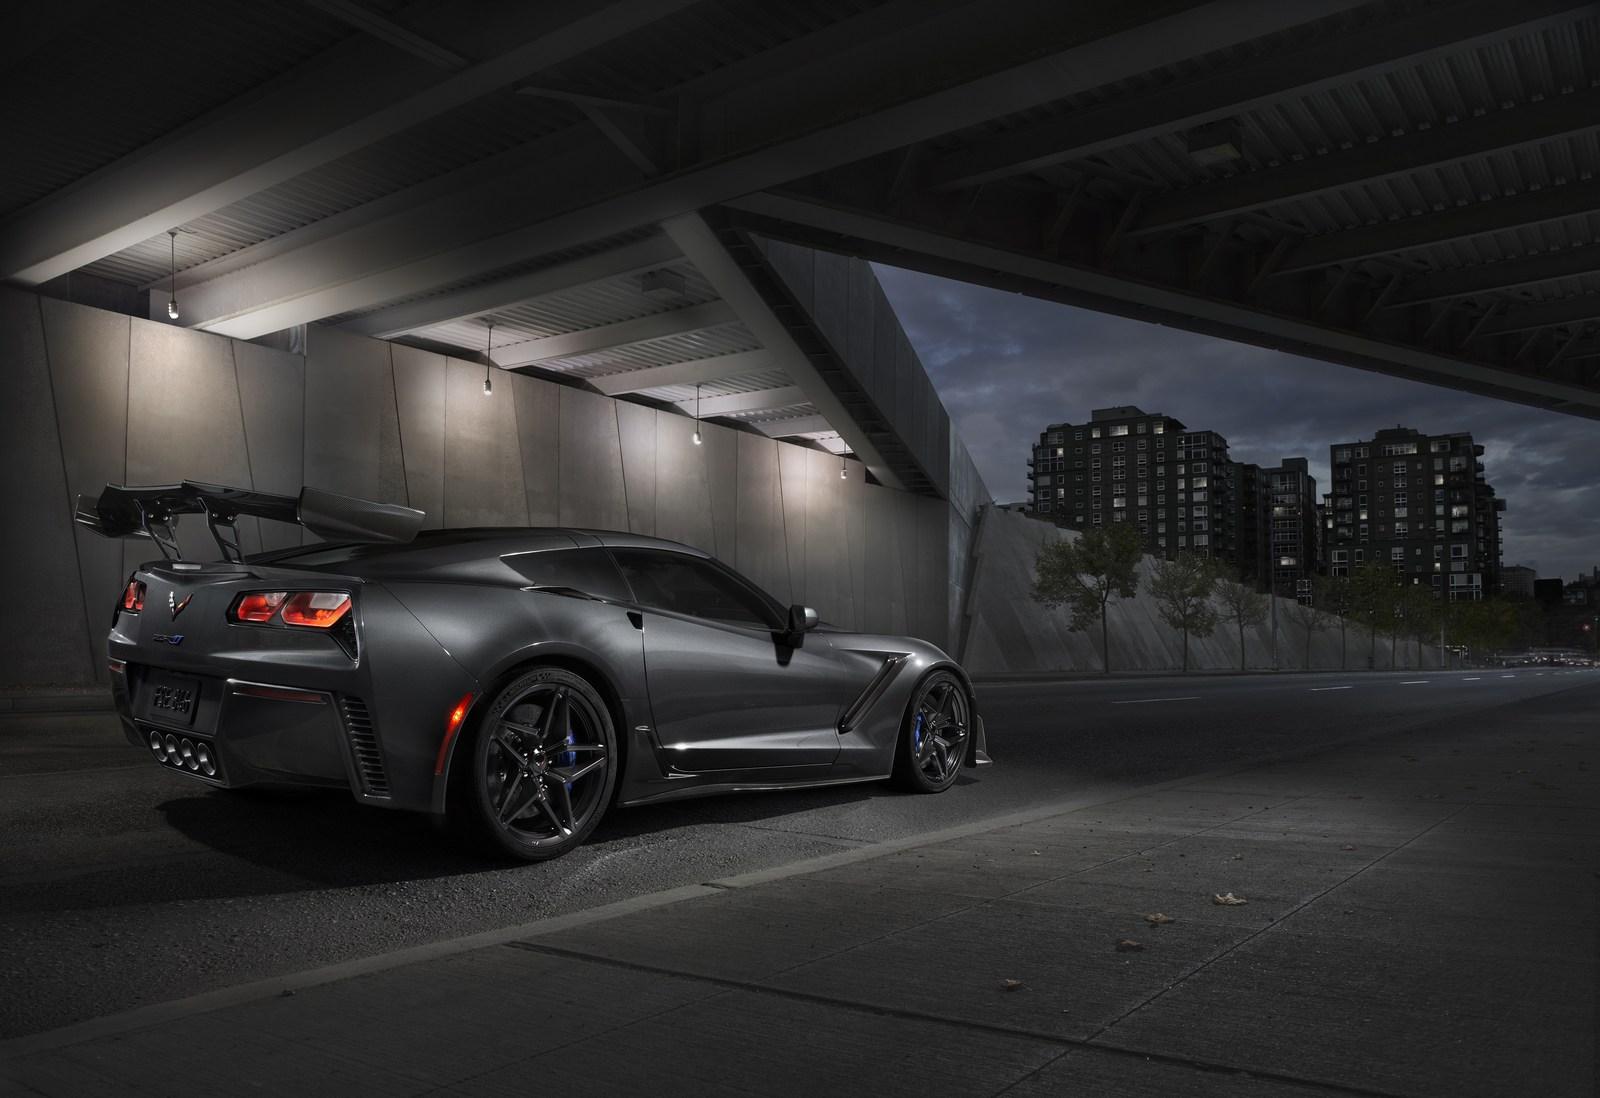 Chevrolet Corvette ZR1 lateral